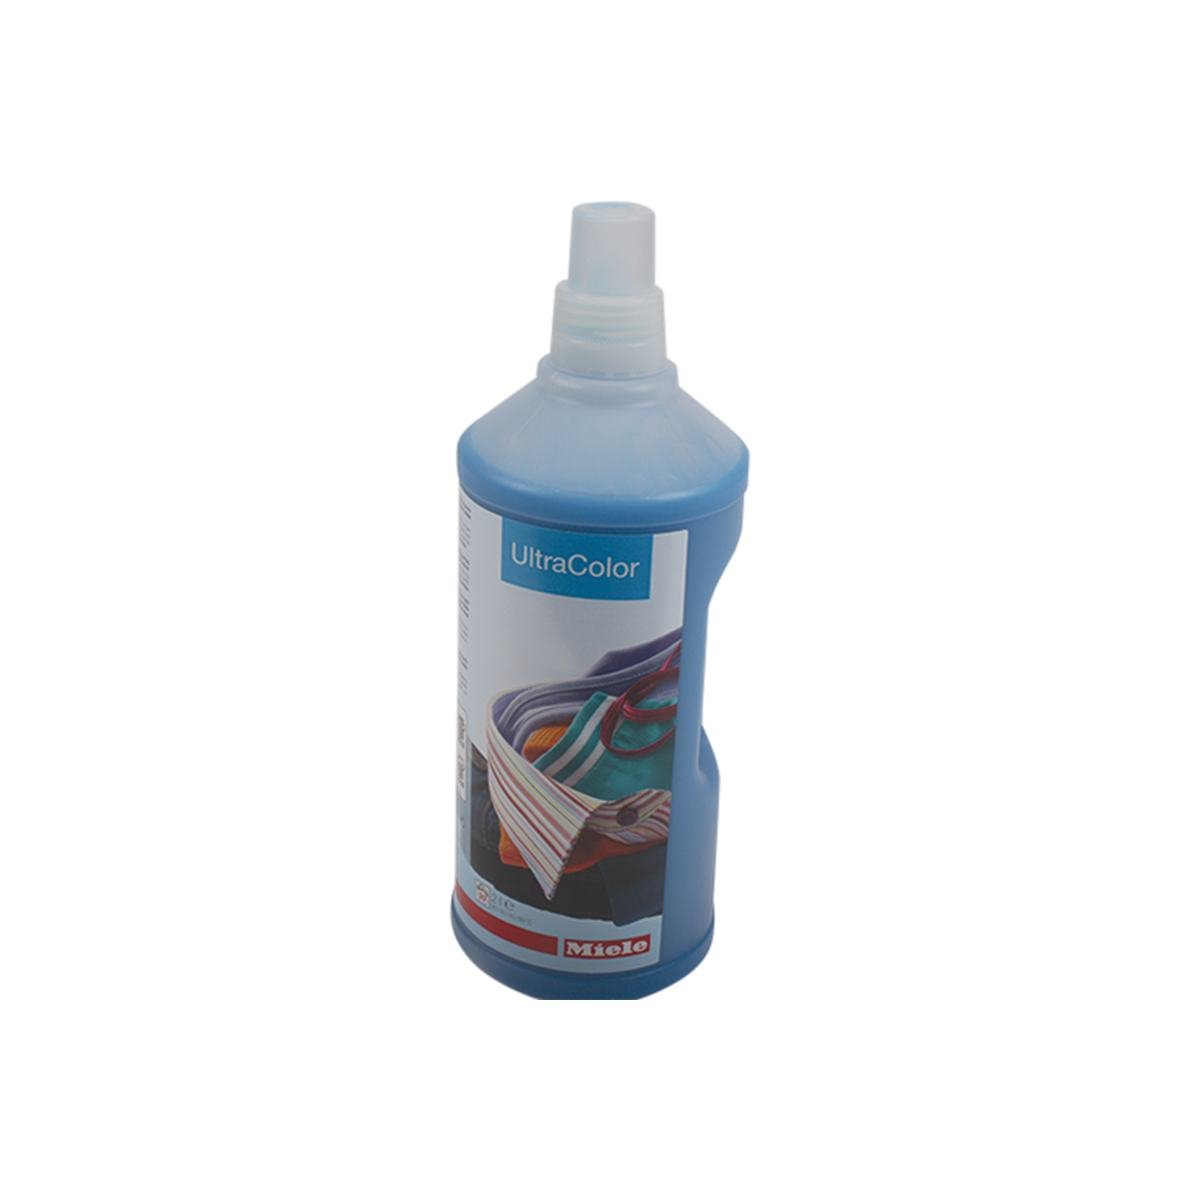 UltraColor tvättmedel 2 lit. - Miele